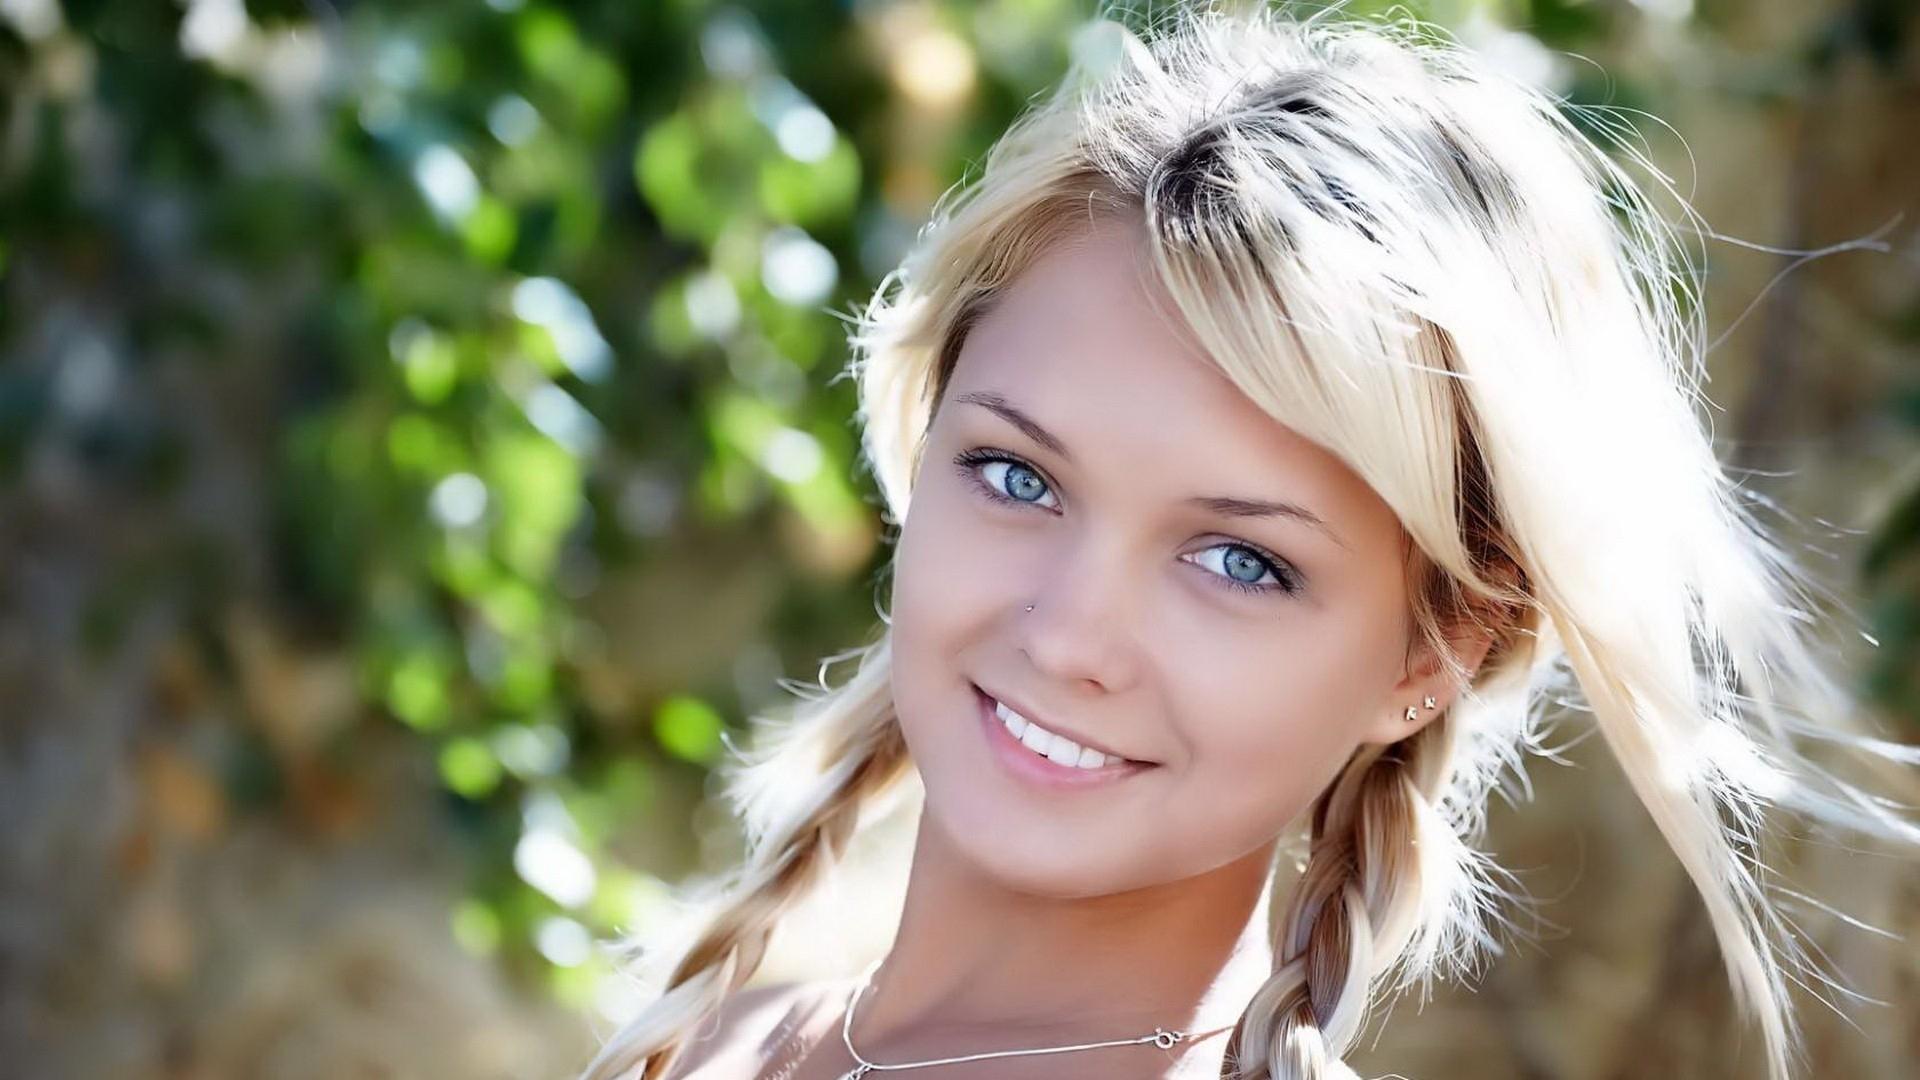 Blue Eyes Girls HD Images Beautiful Girls Wallpaper 1920x1080